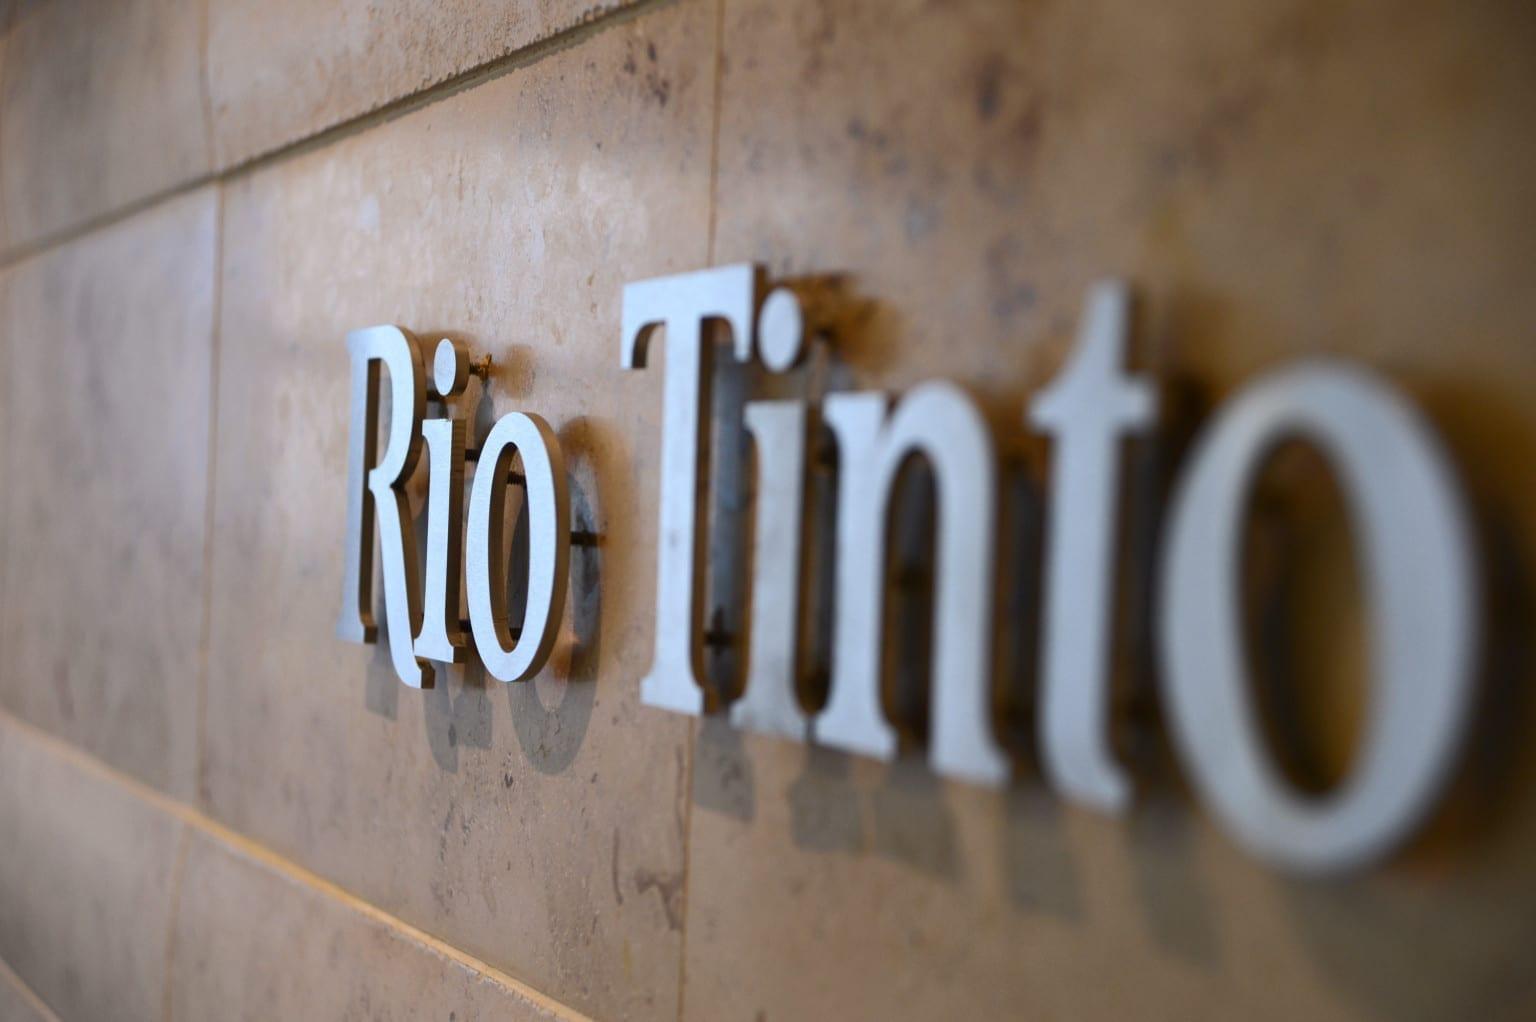 Rio Tinto delivers superior shareholder returns